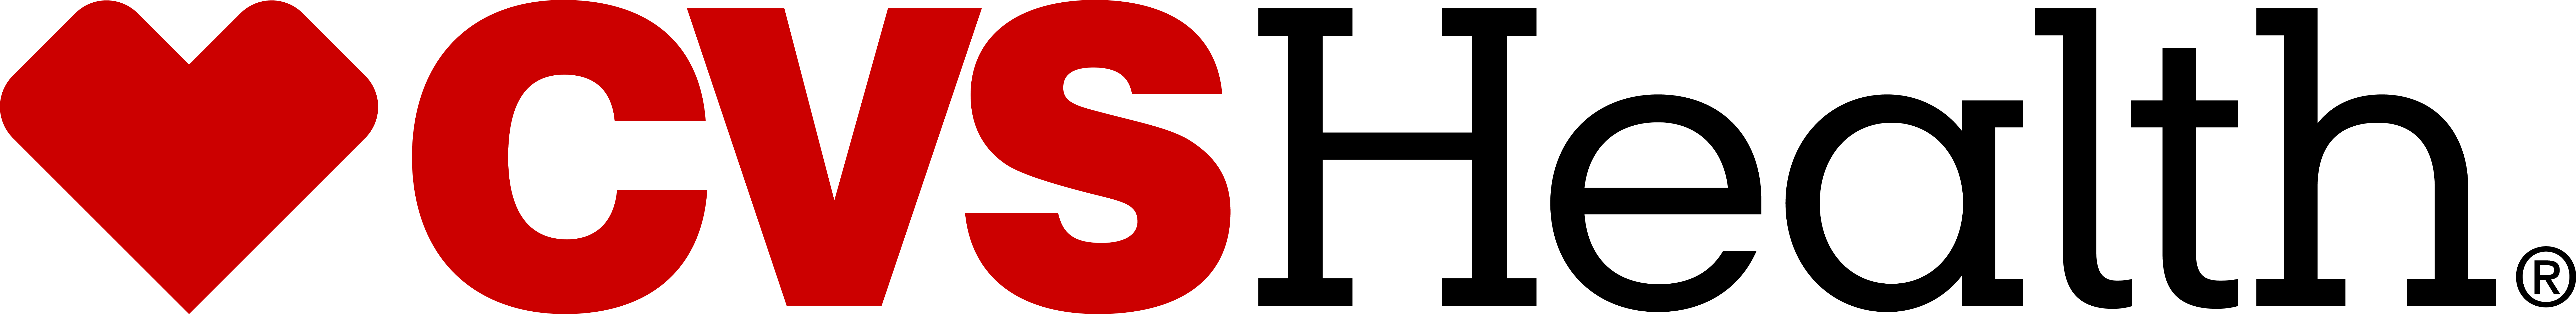 CVS_Health_logo_h_reg_rgb_redblk